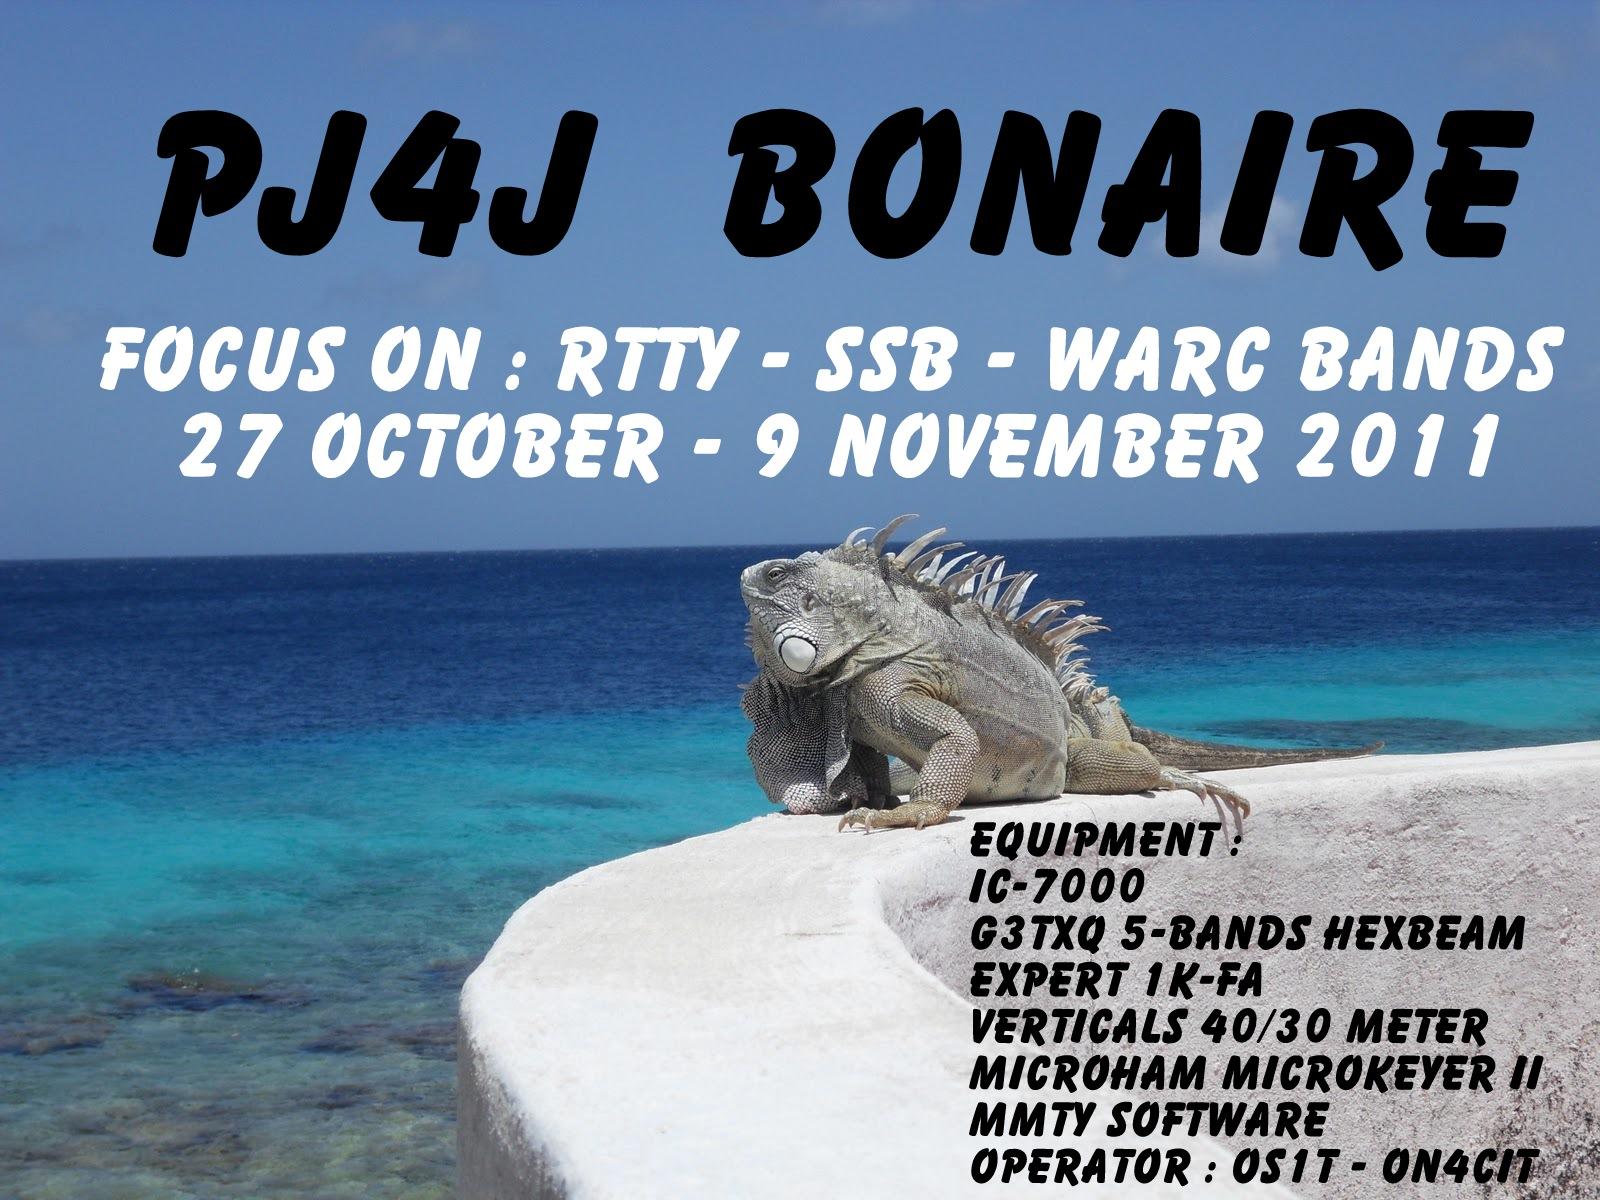 Bonaire Island PJ4J